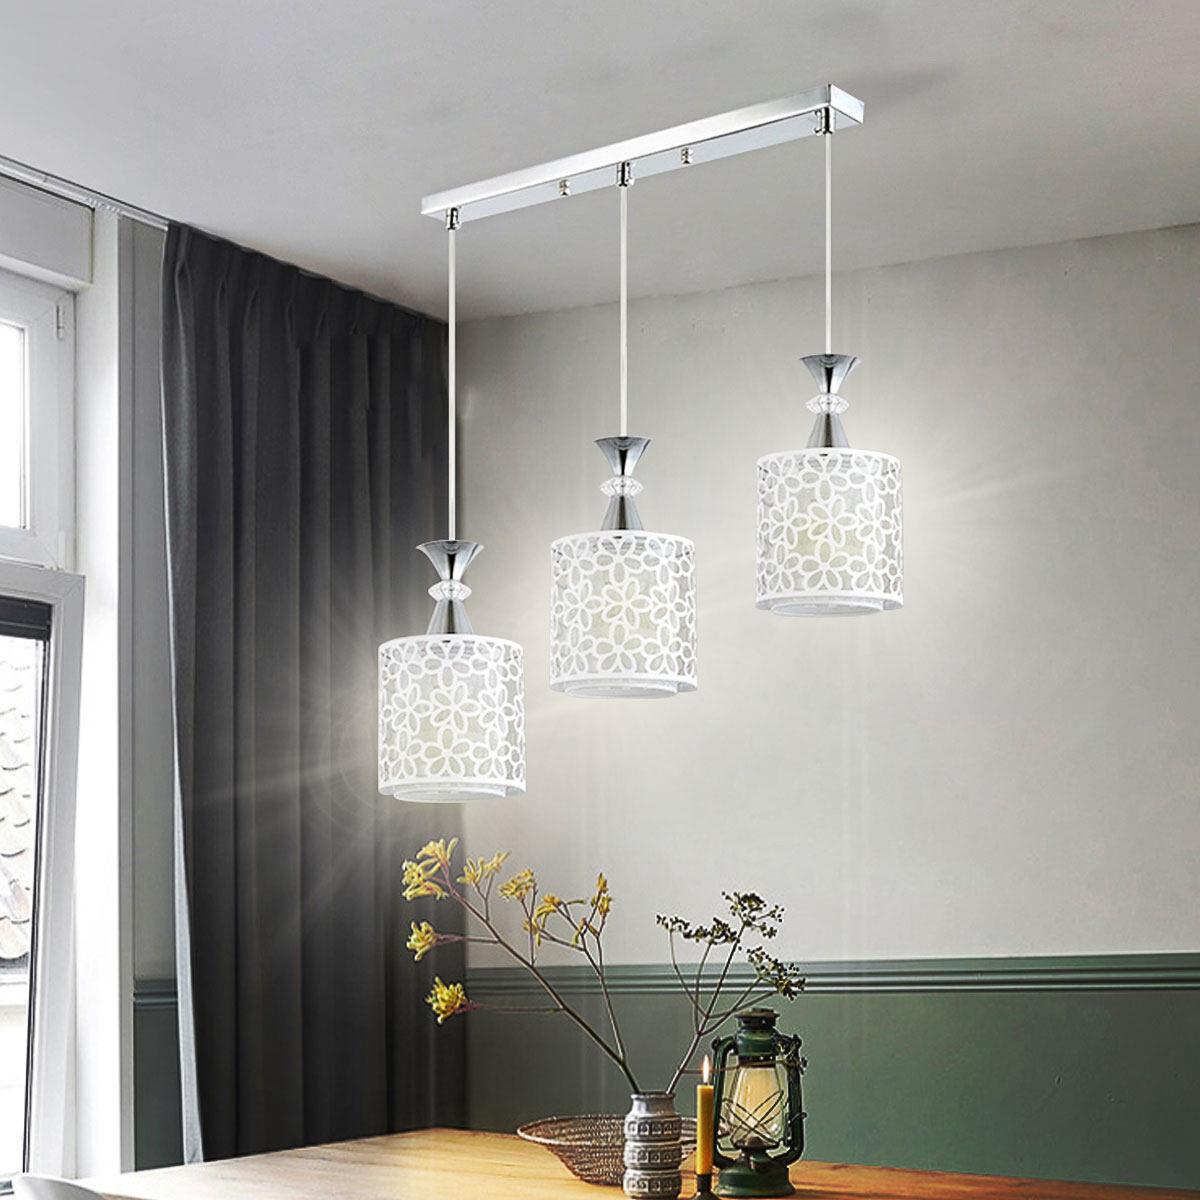 Petal Ceiling Light Led Pendant Lamp